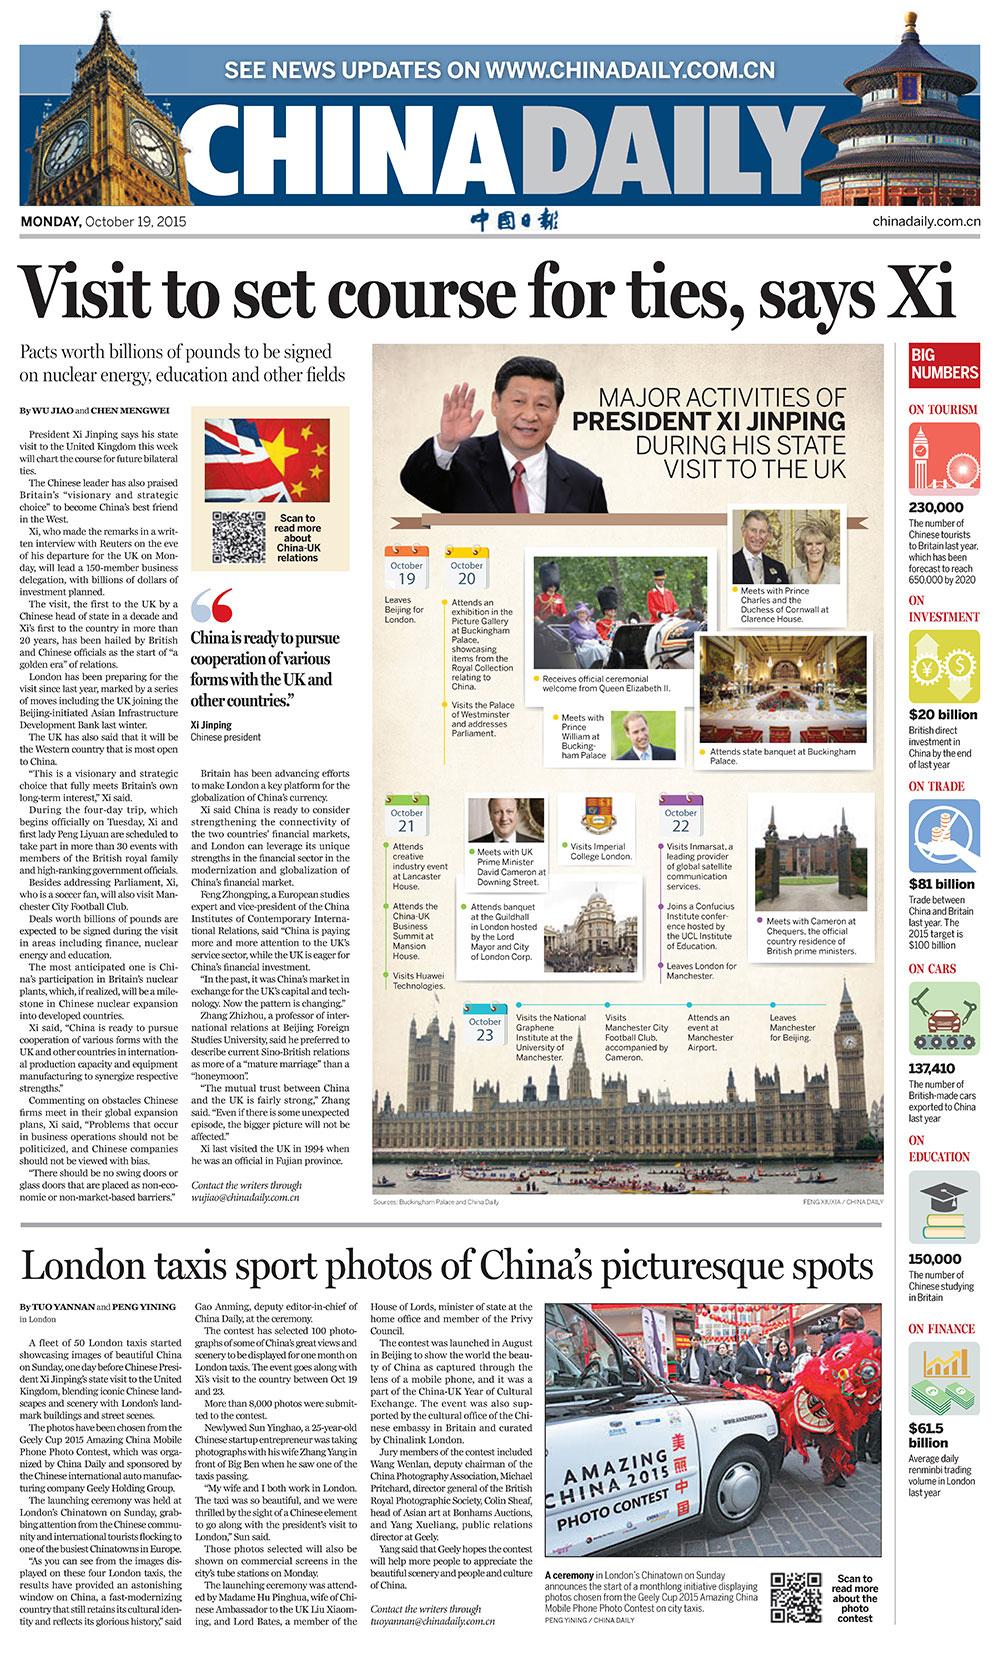 'China Daily,' European edition, October 19, 2015.